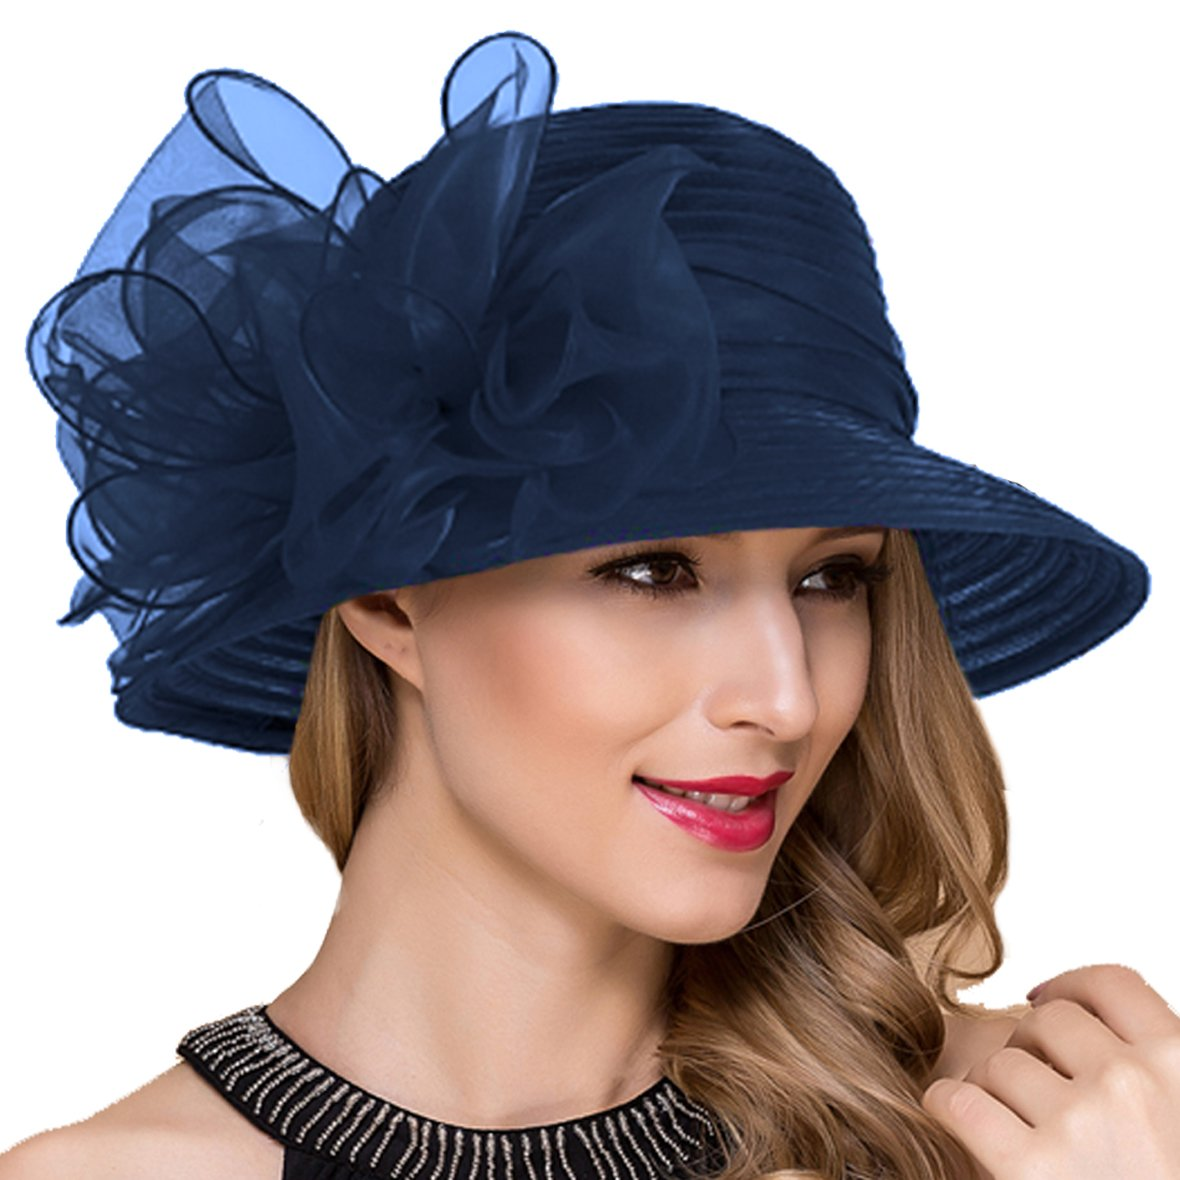 Lady Church Derby Dress Cloche Hat Fascinator Floral Tea Part Bucket Hat S051 (Navy)